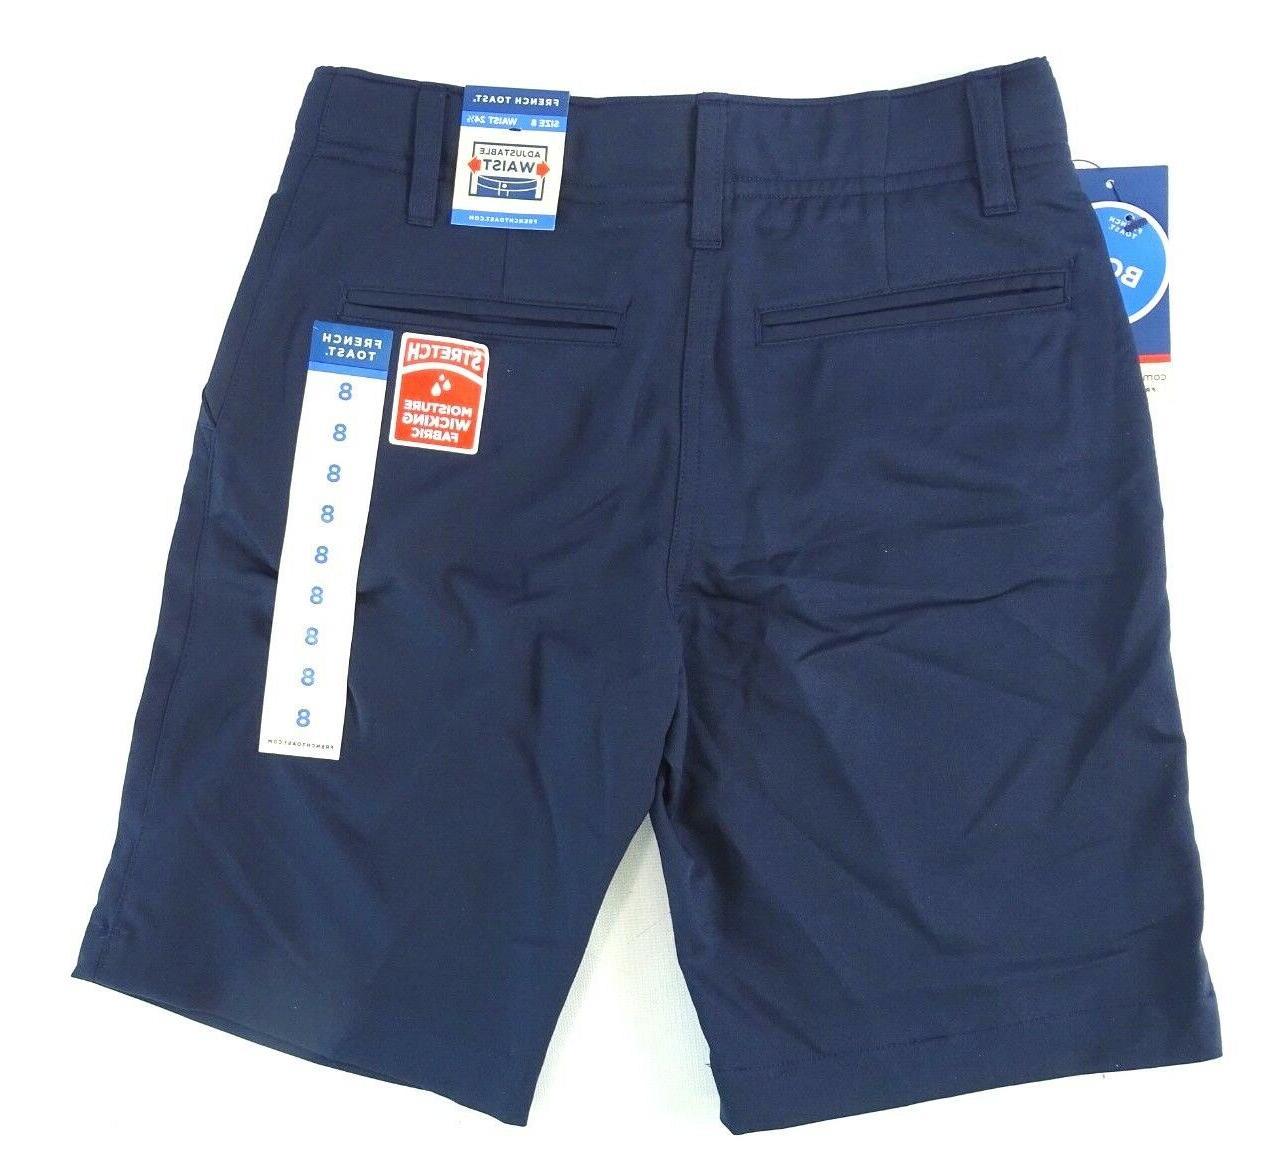 New! Uniform Moisture Wicking Pants